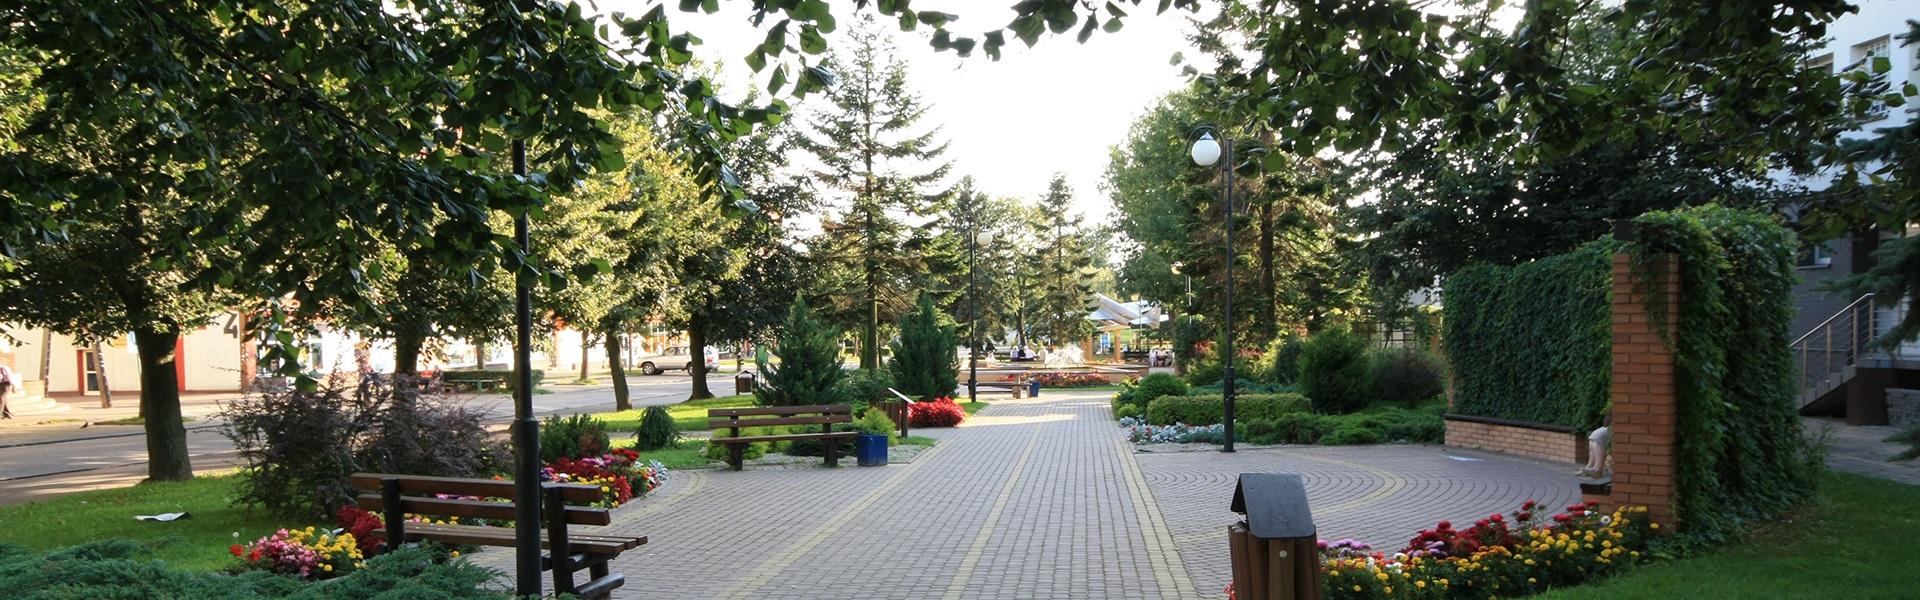 monki park